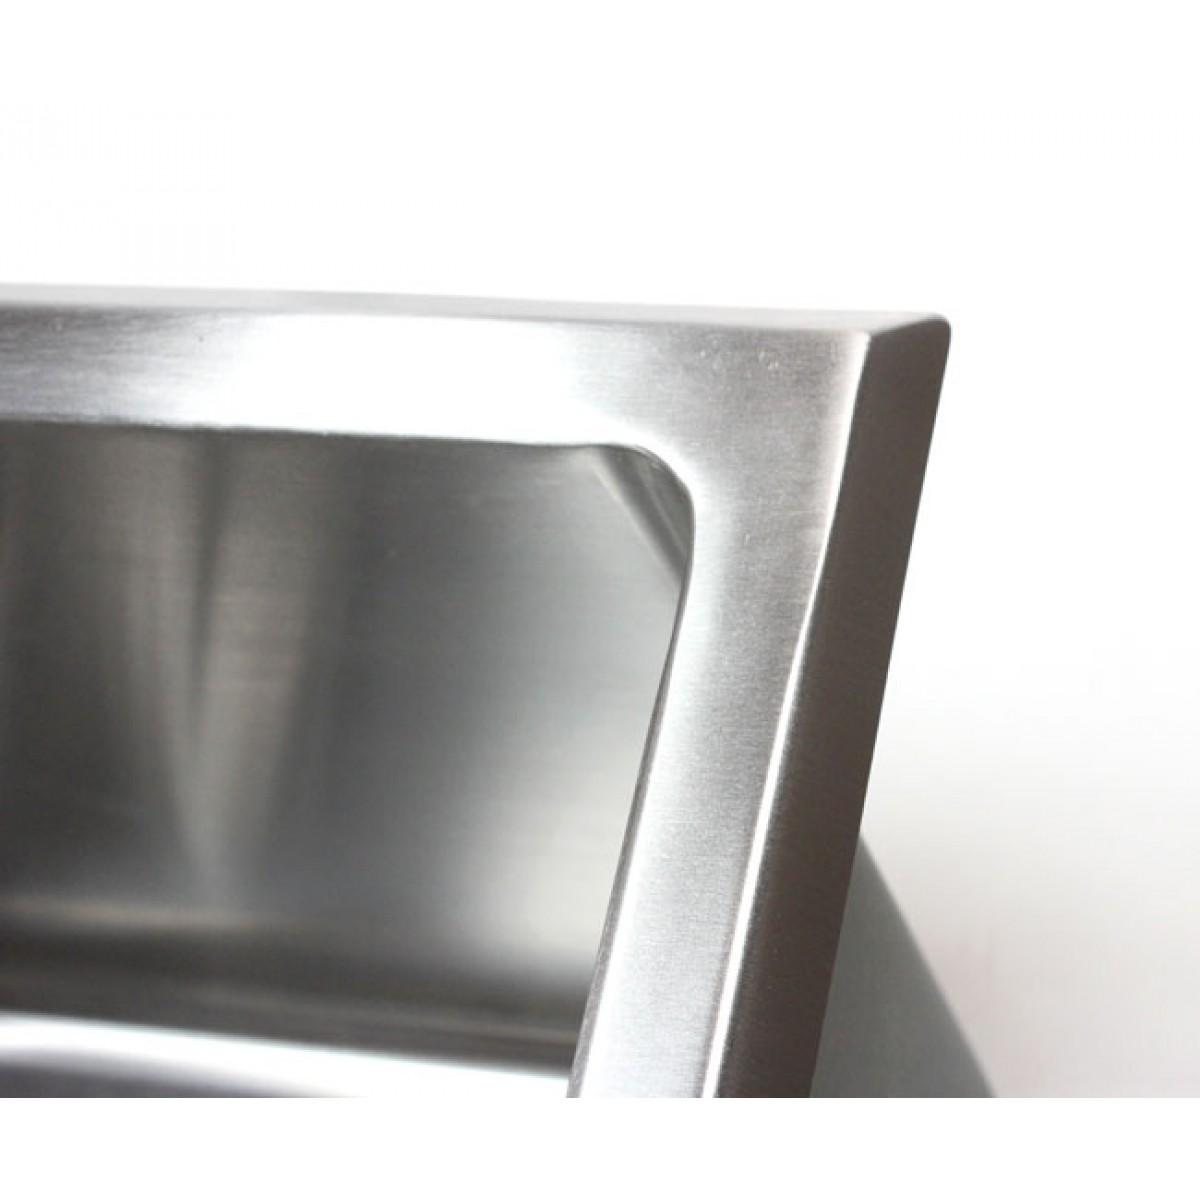 Stainless Steel Laundry Sink 12 Deep 510x450mm Handmade